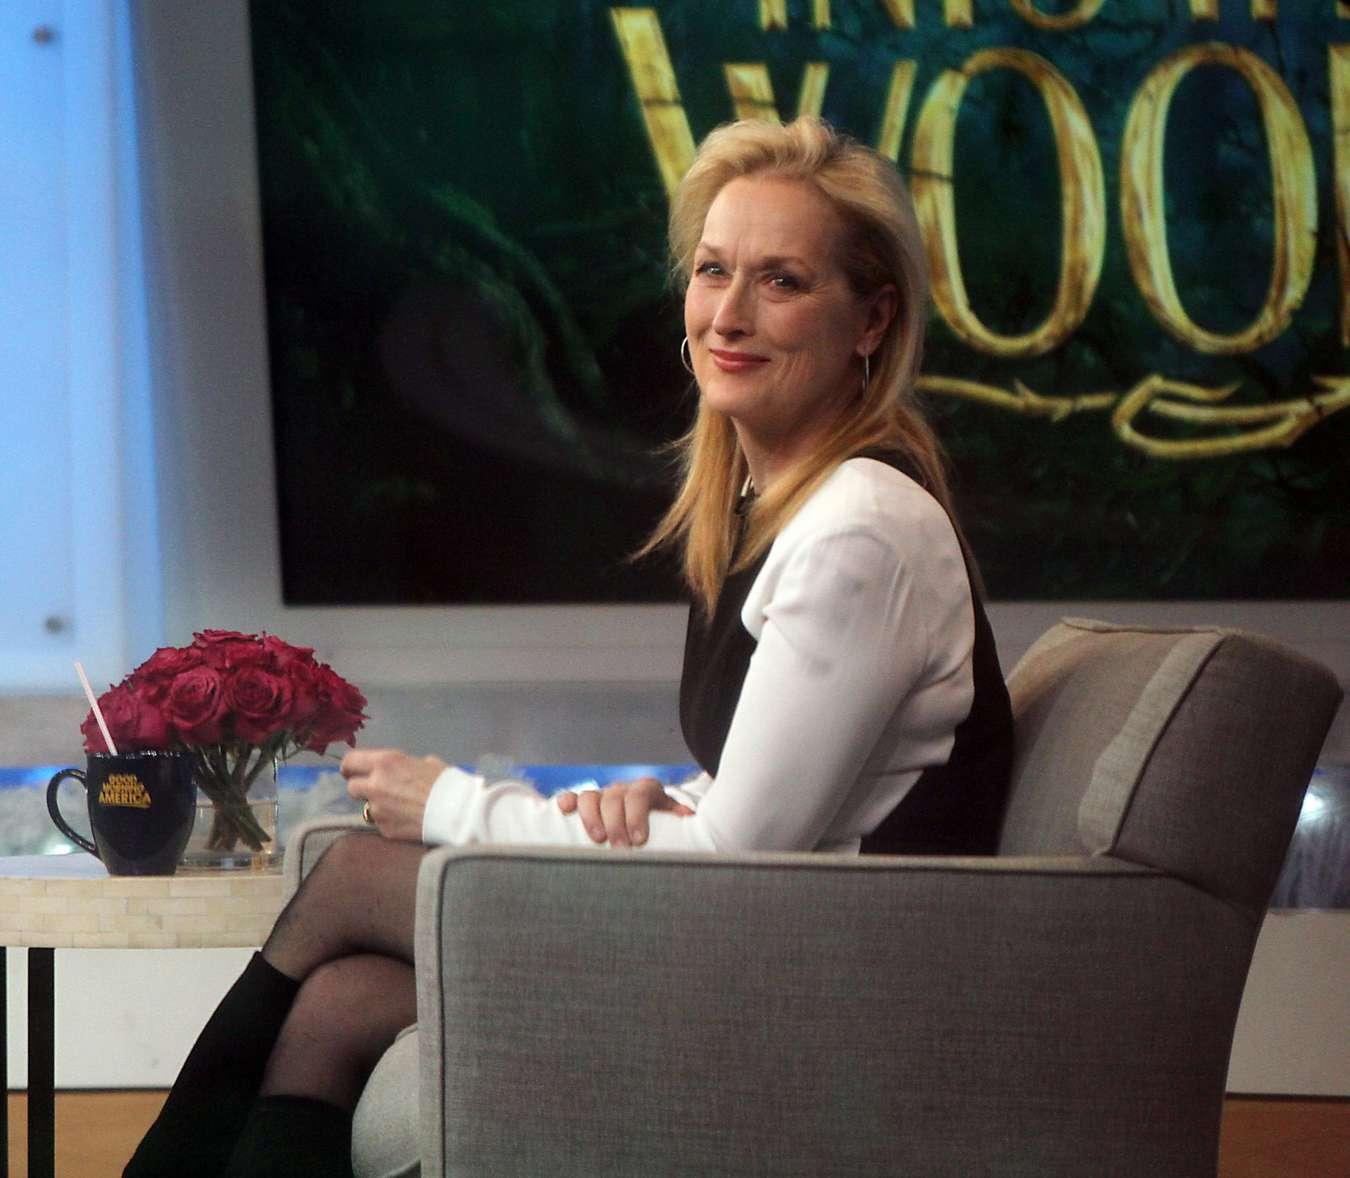 Meryl Streep on Good Morning America in New York